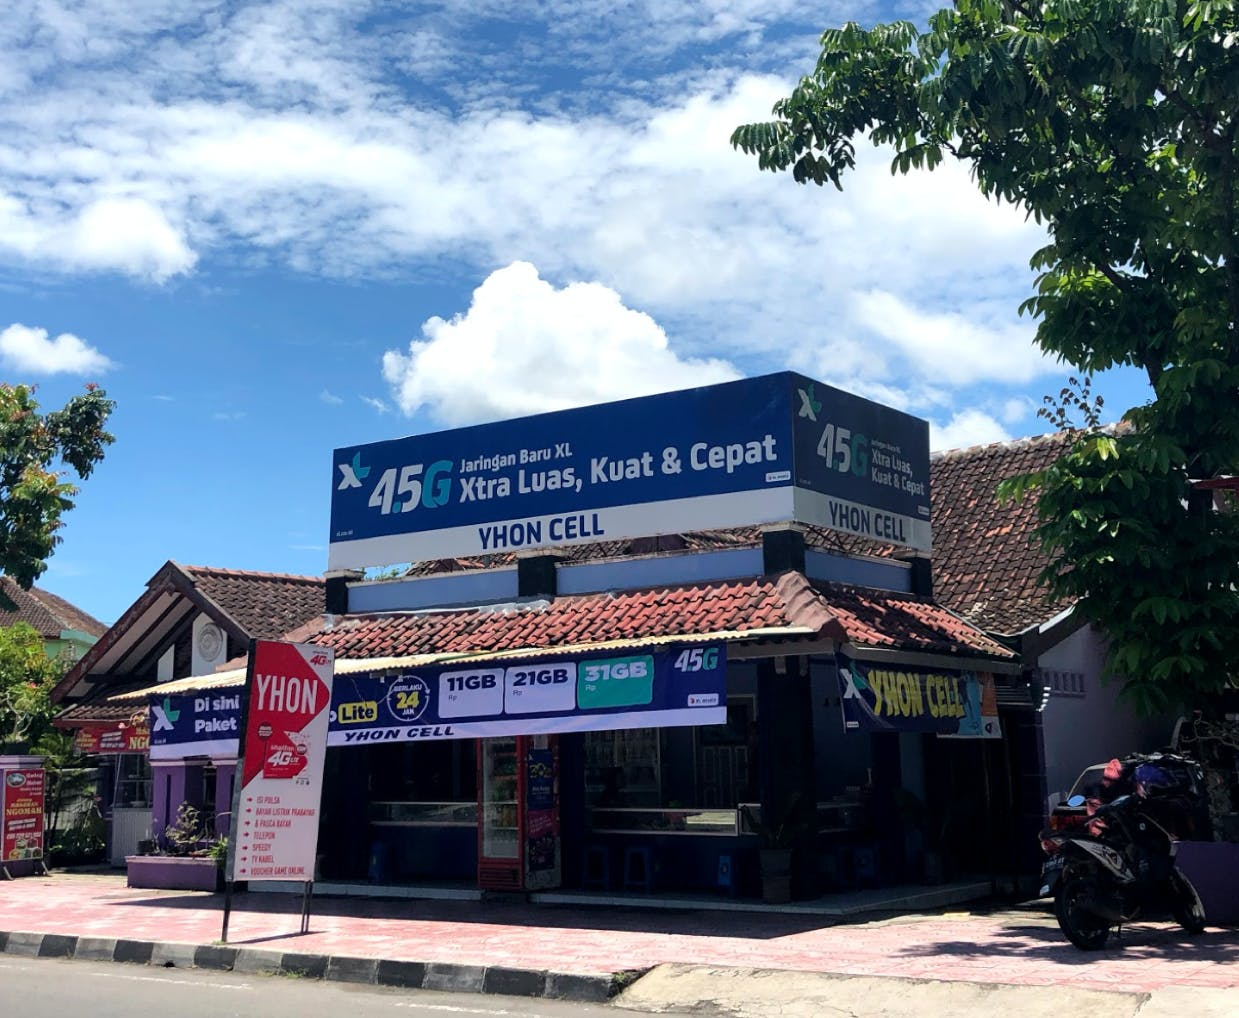 A telecom shop in Yogyakarta